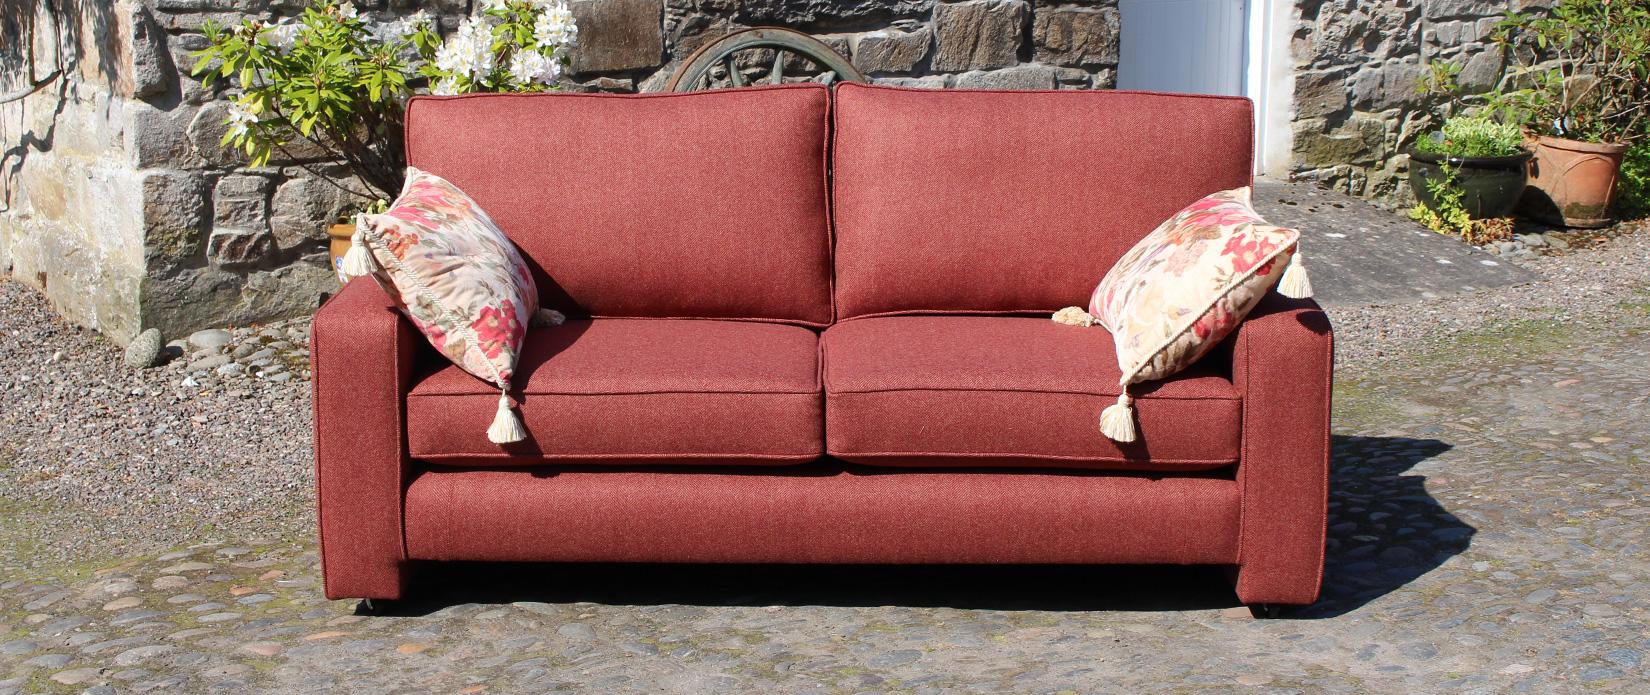 Country sofas home buckingham parisarafo Choice Image